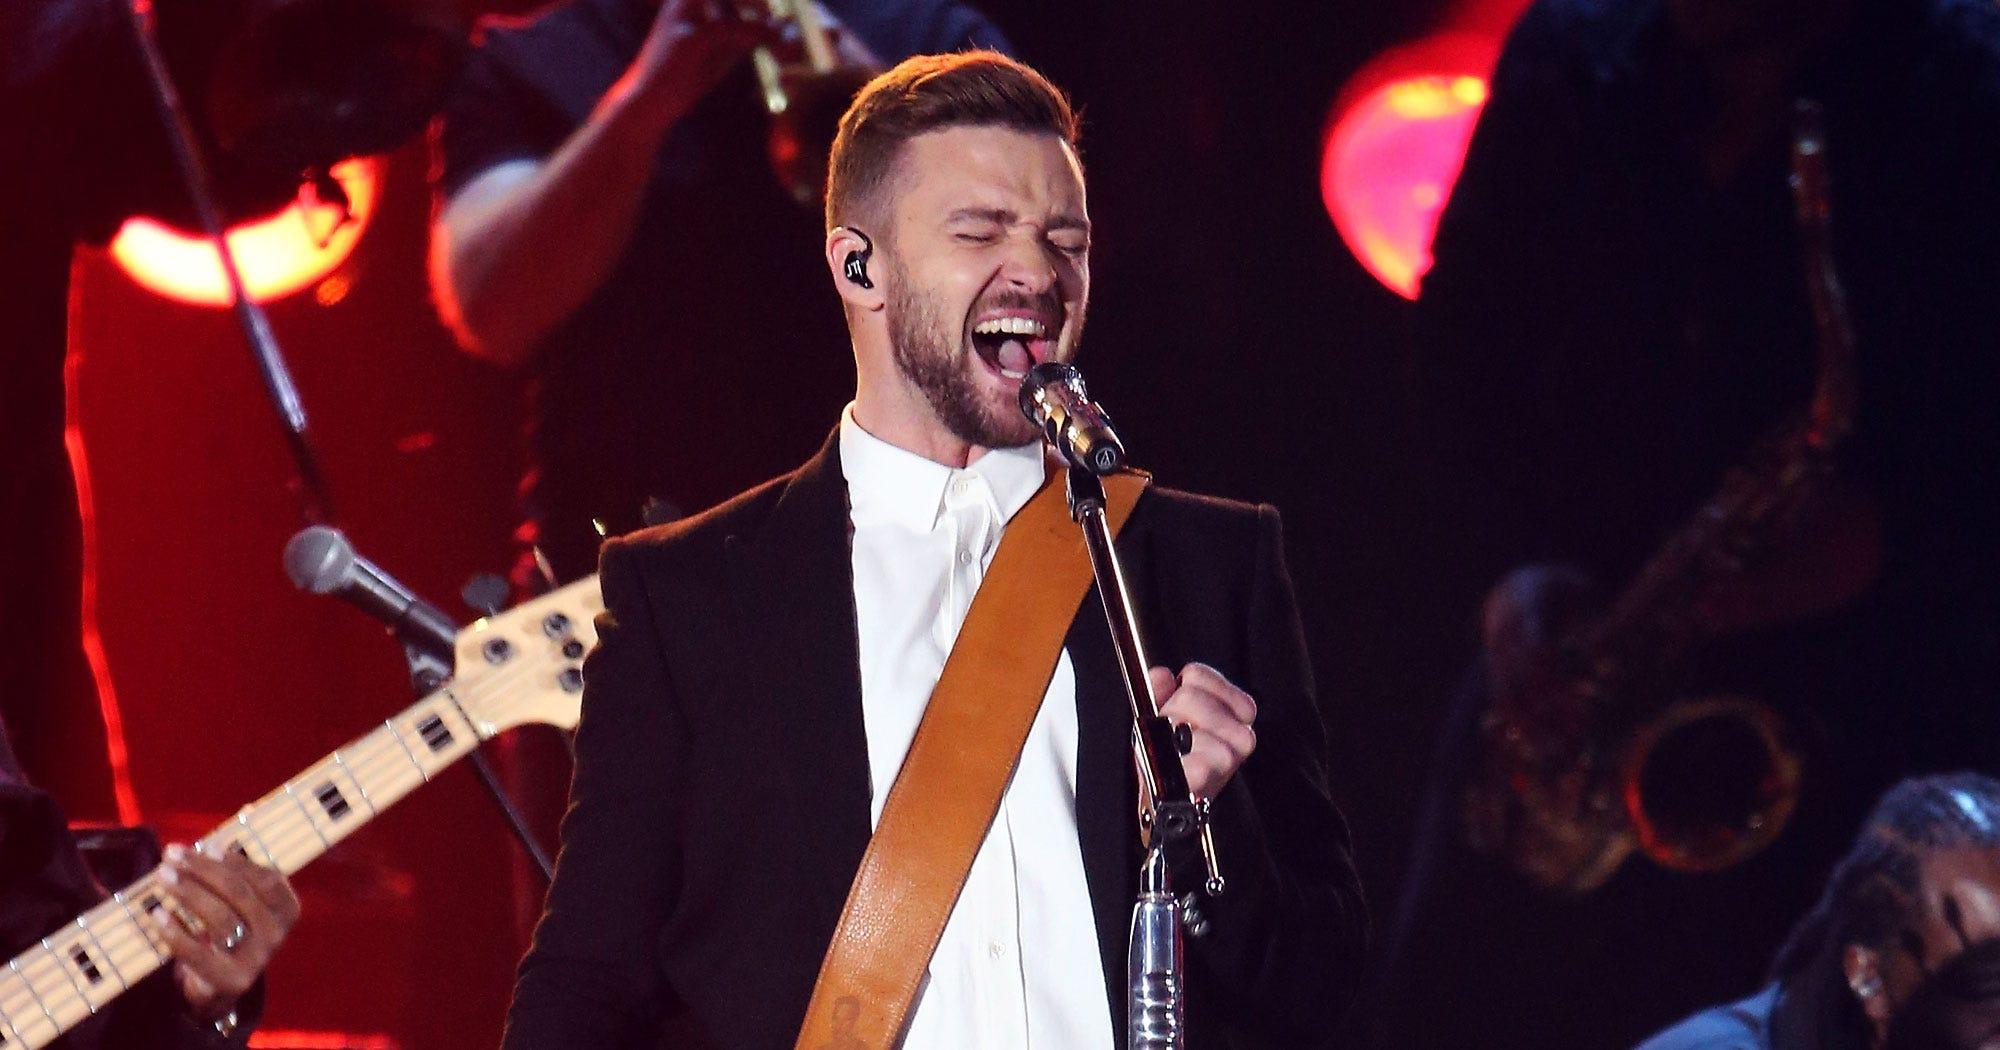 Justin Timberlake 2015 Cma Performance Drink You Away